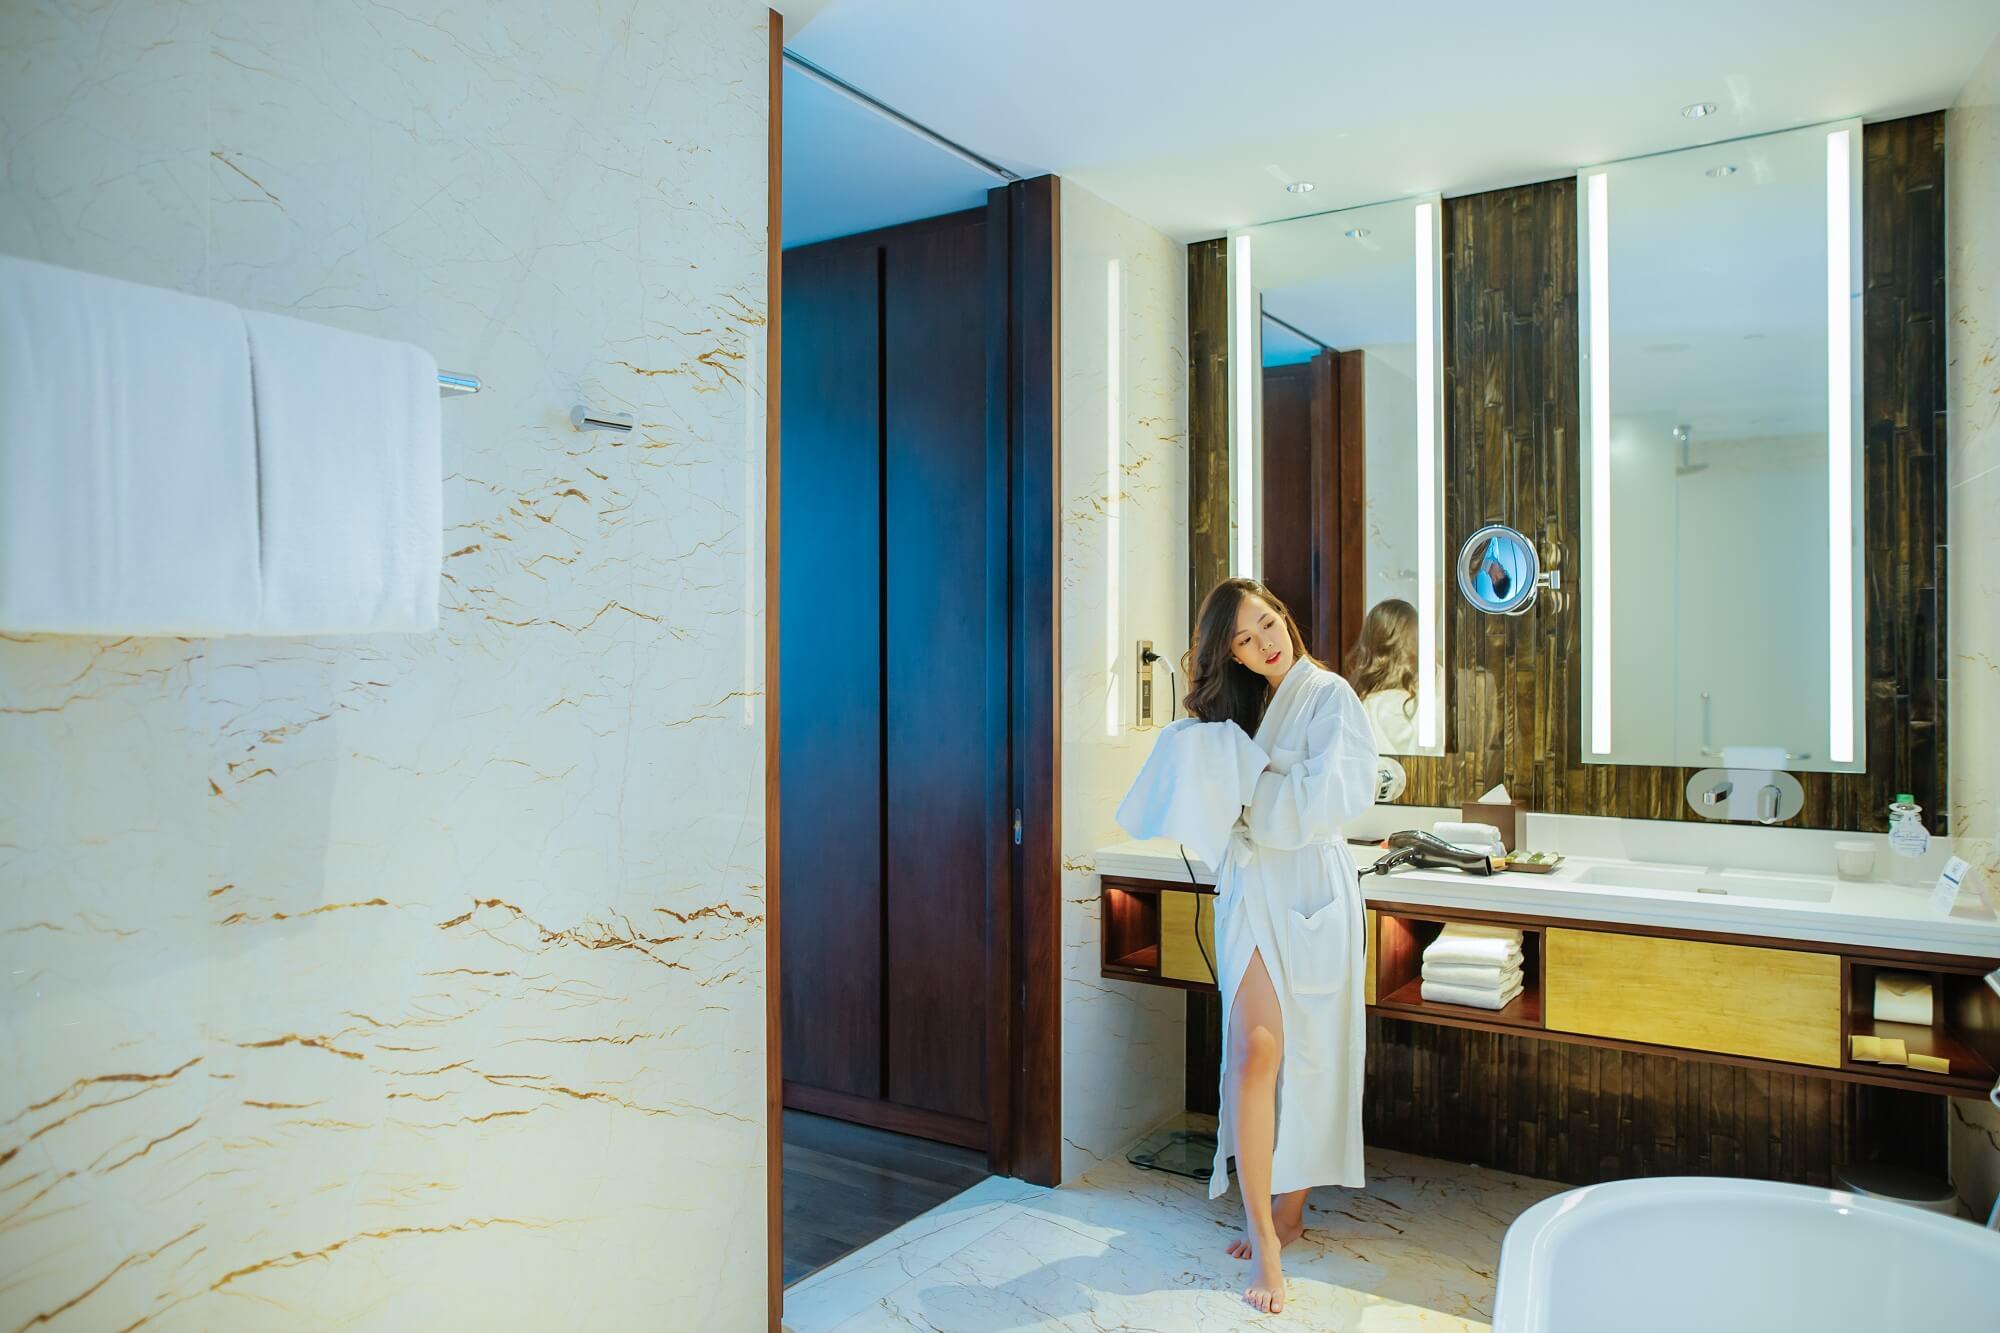 Suite Room Hilton Da Nang Trai Nghiem Khach San Day Phong Cach Giua Long Thanh Pho Danang Fantasticity 06